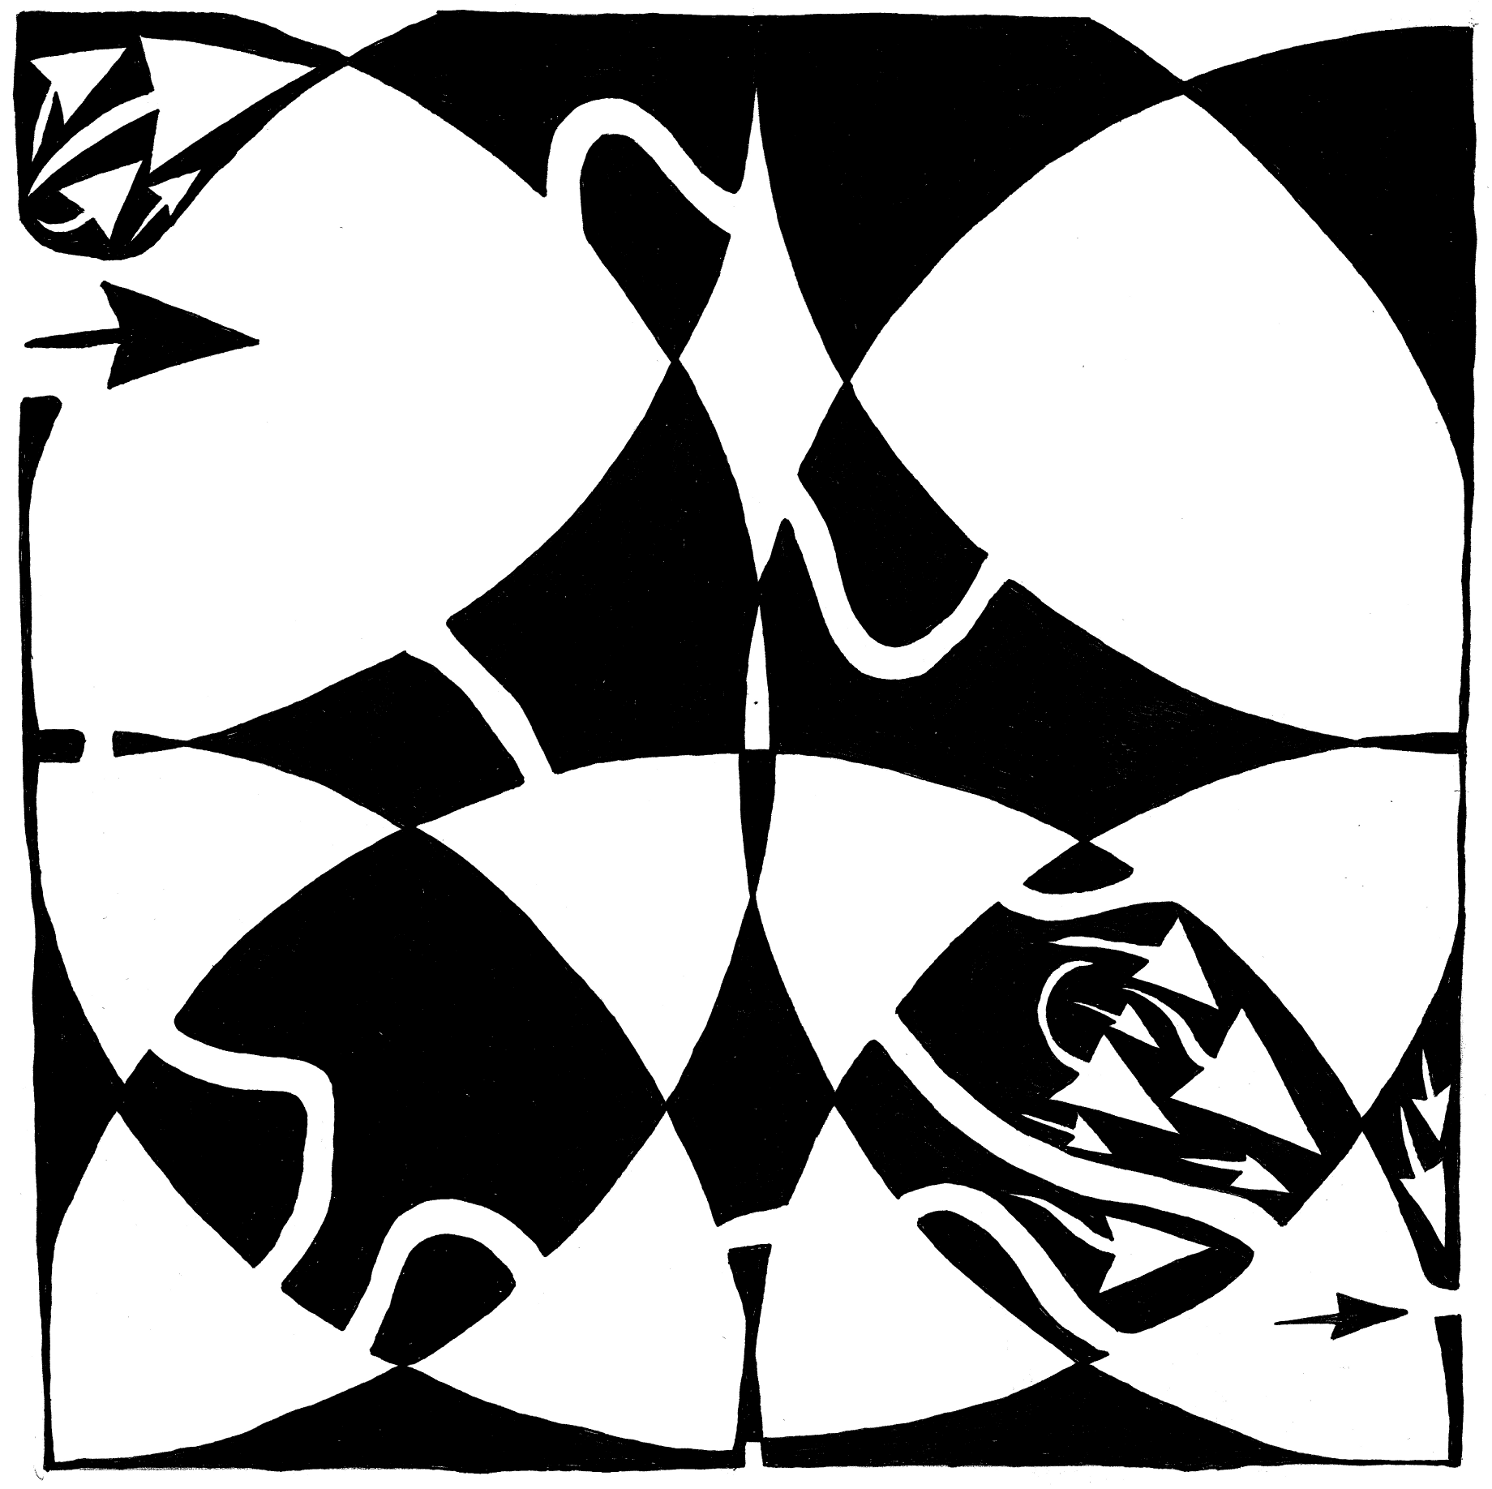 Rorschach maze art by Yonatan Frimer